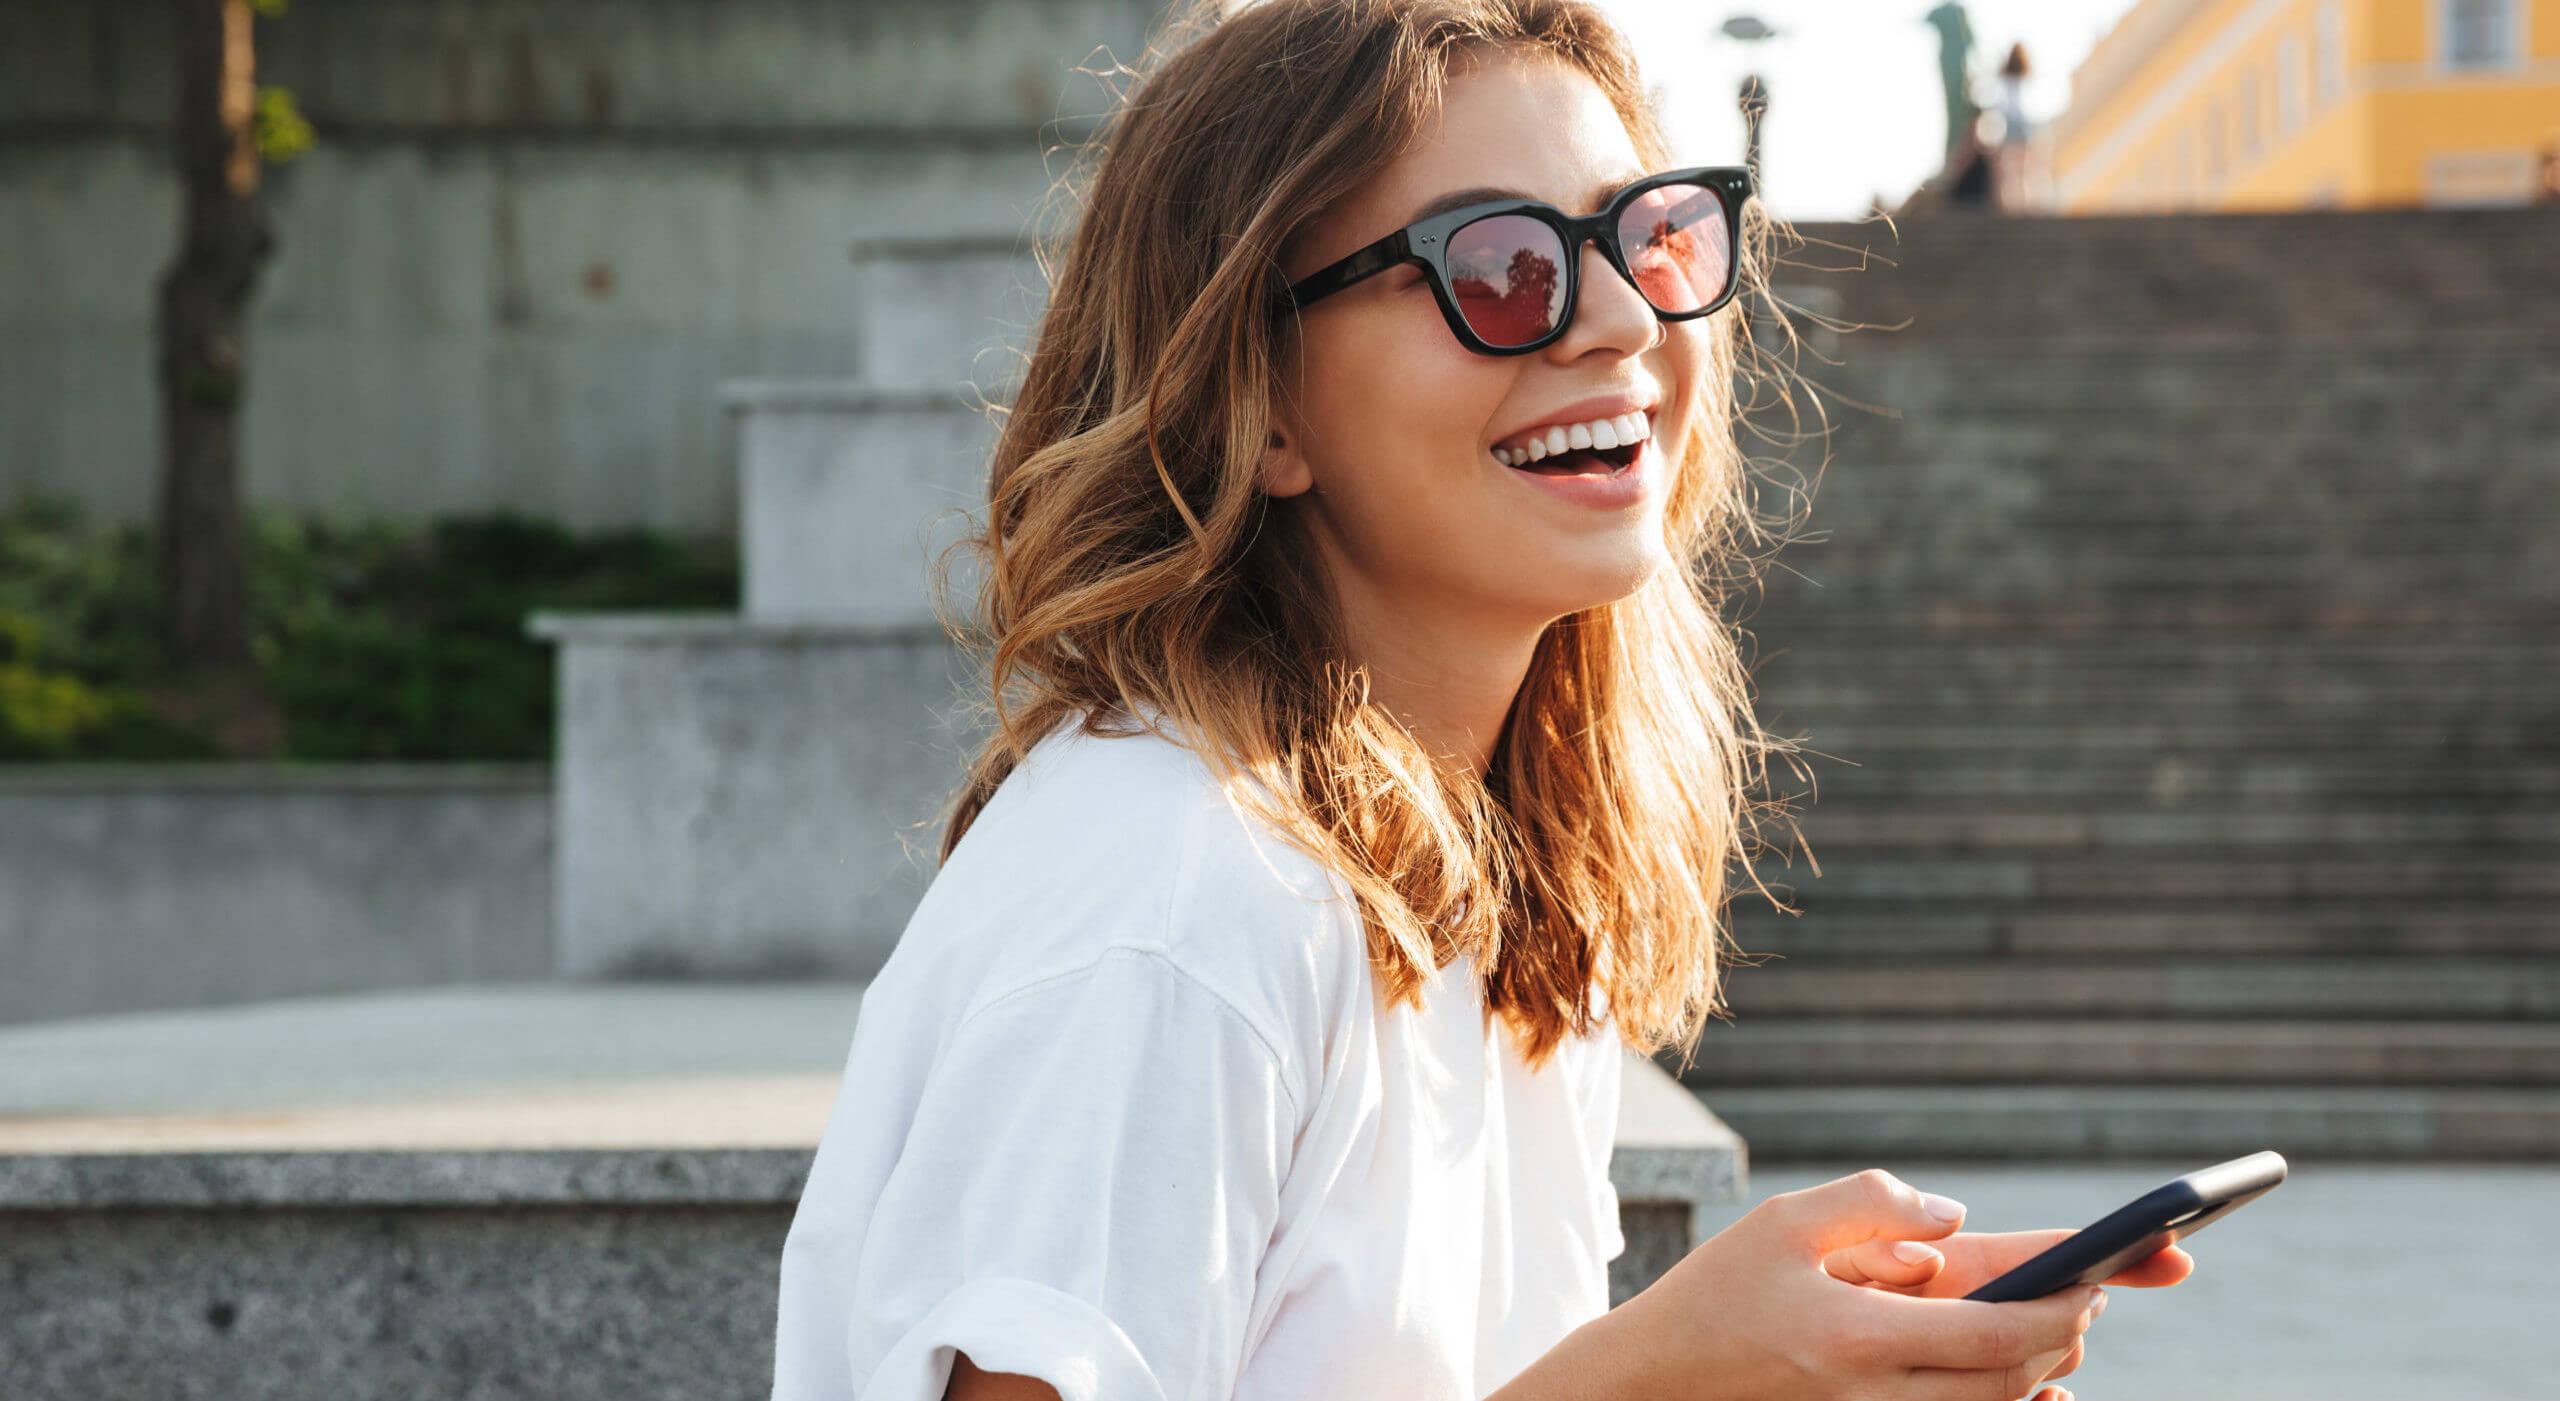 picture-of-european-brunette-wearing-sunglasses_640x350.jpeg